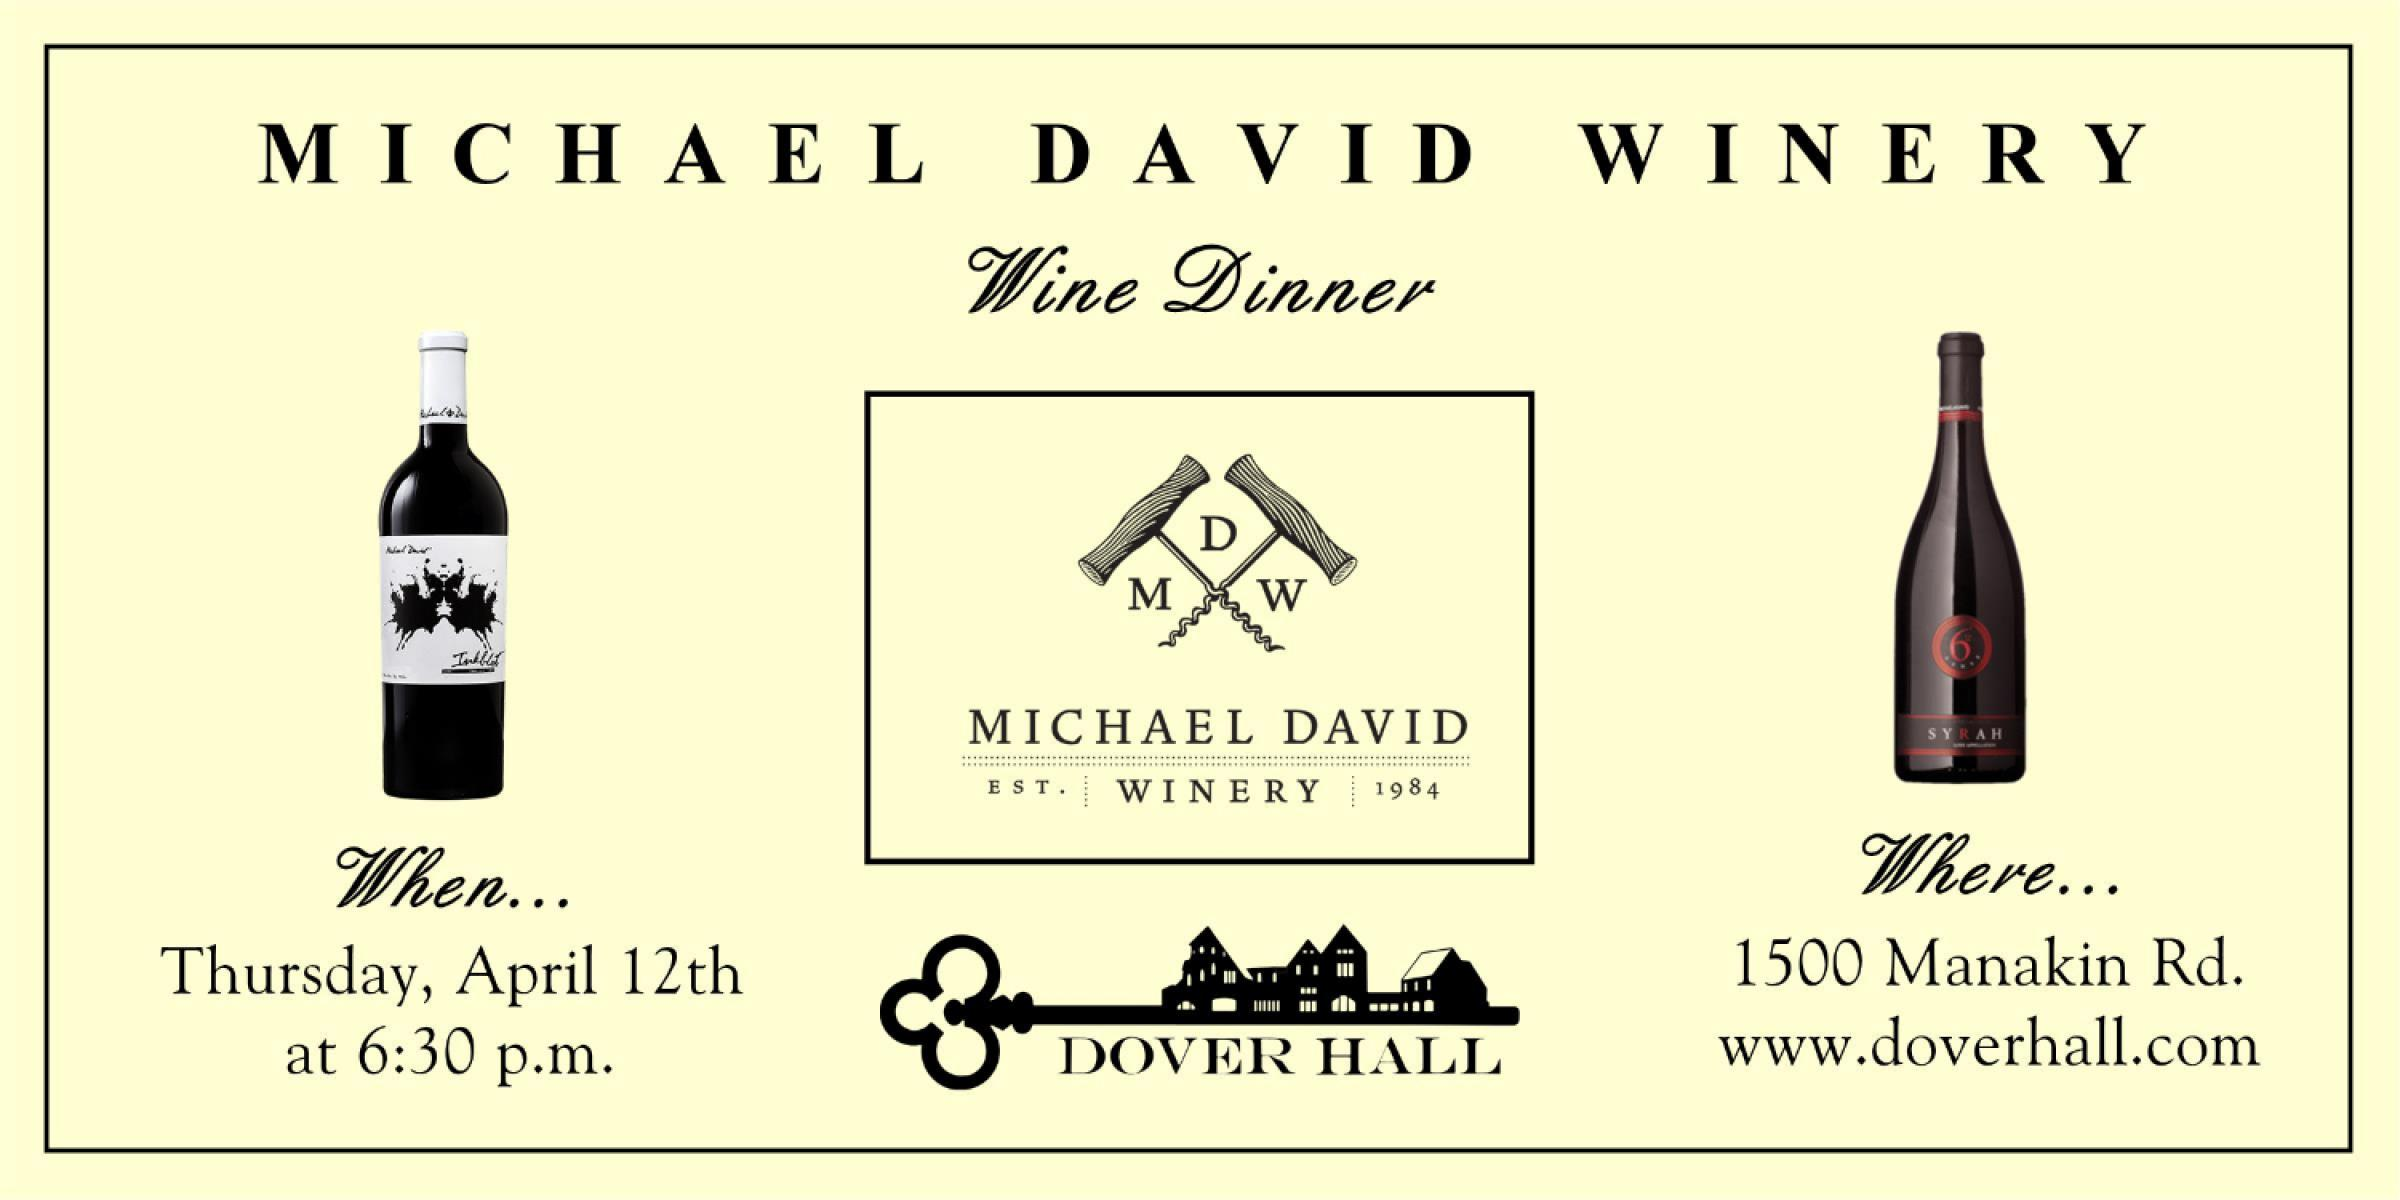 Michael David Winery Wine Dinner